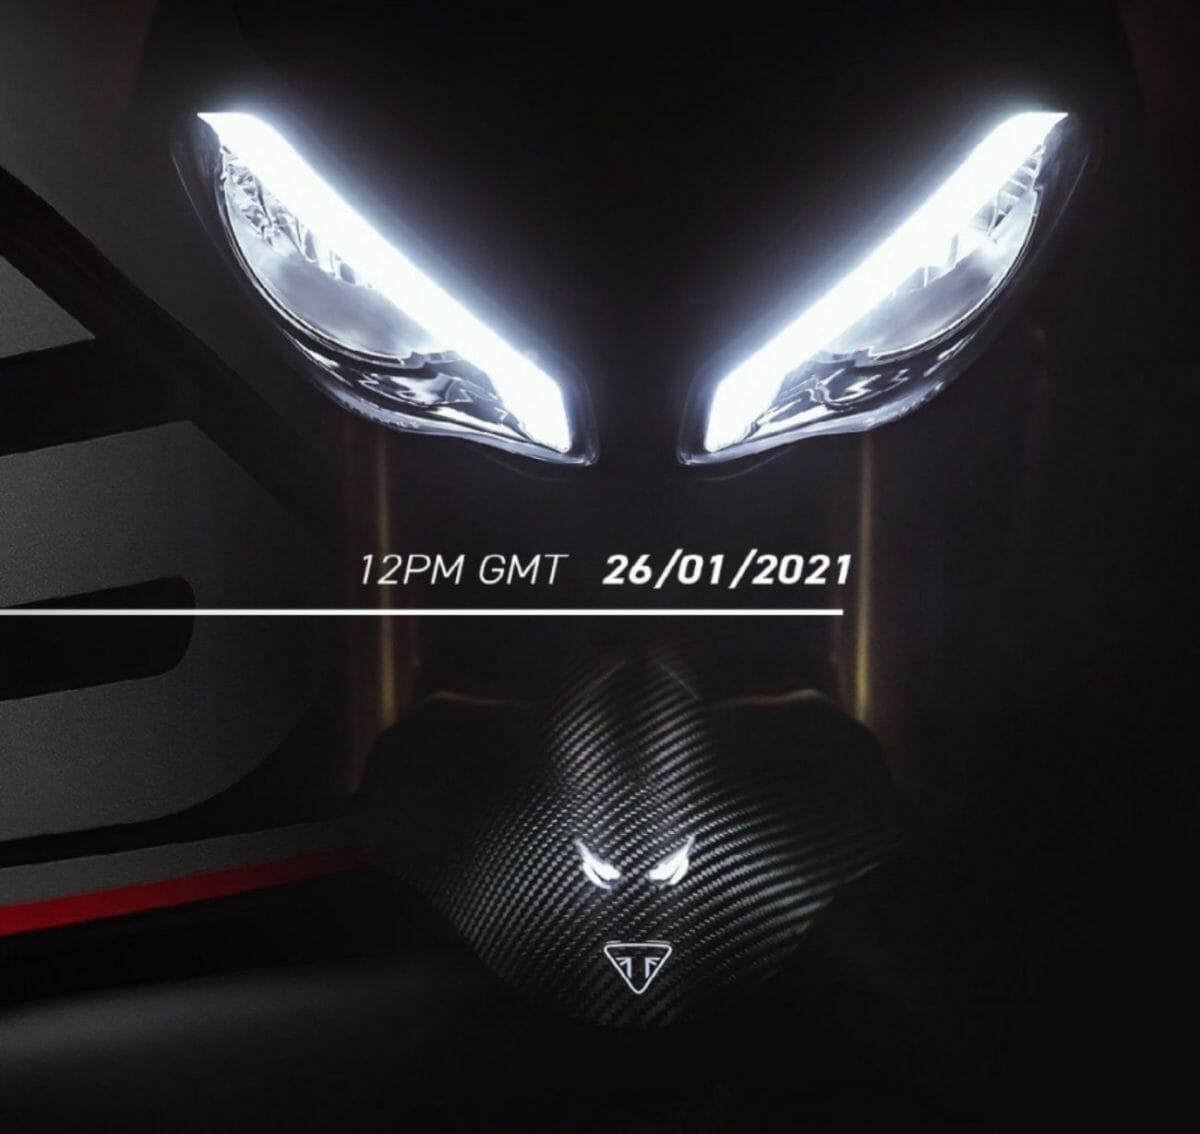 Triumph Speed triple 1200 RS teaser (1)